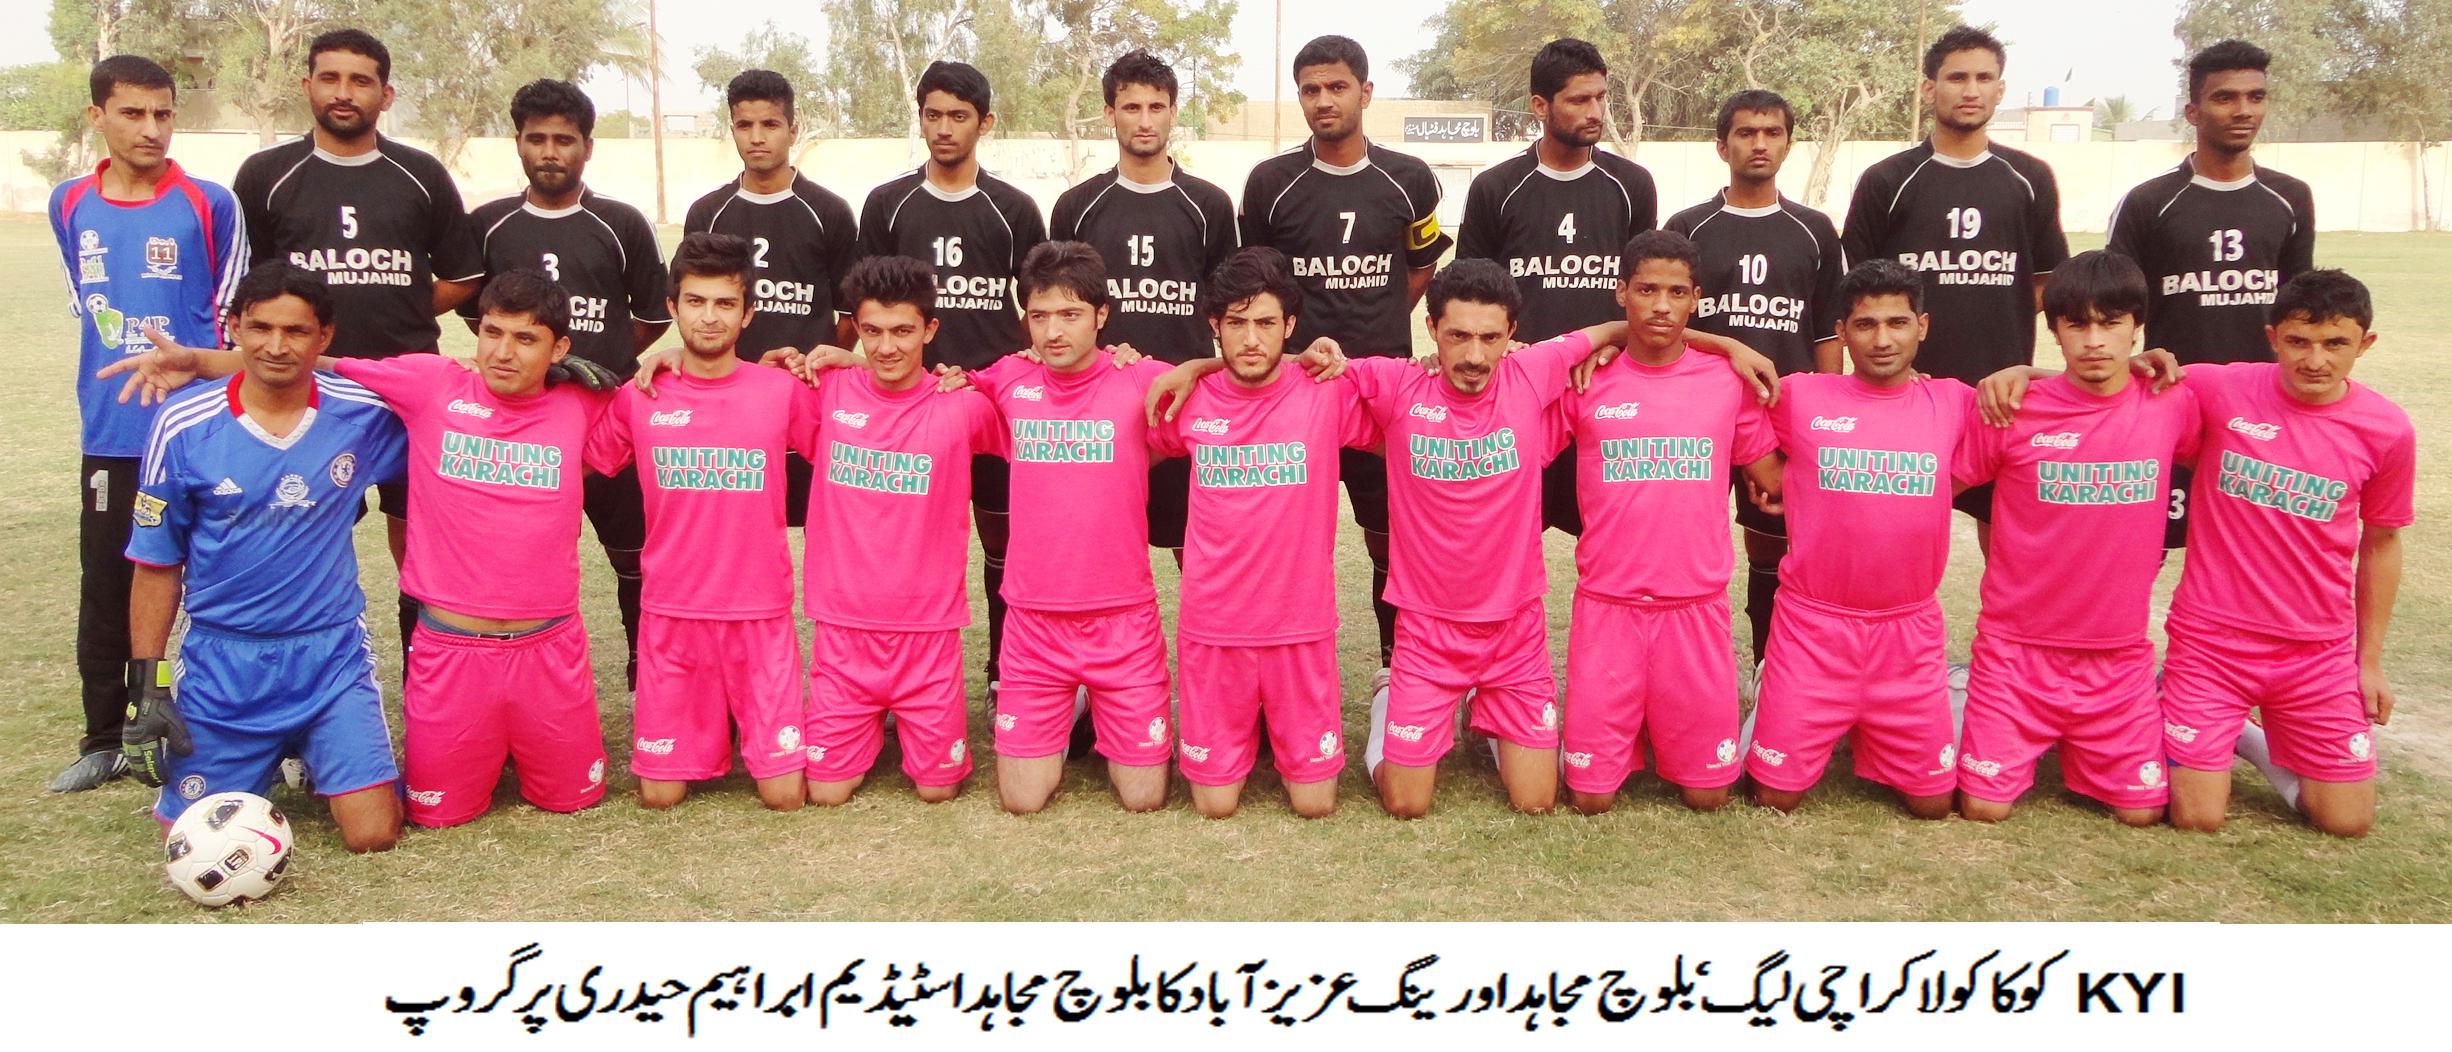 Burma Mohammedan up set Karachi United